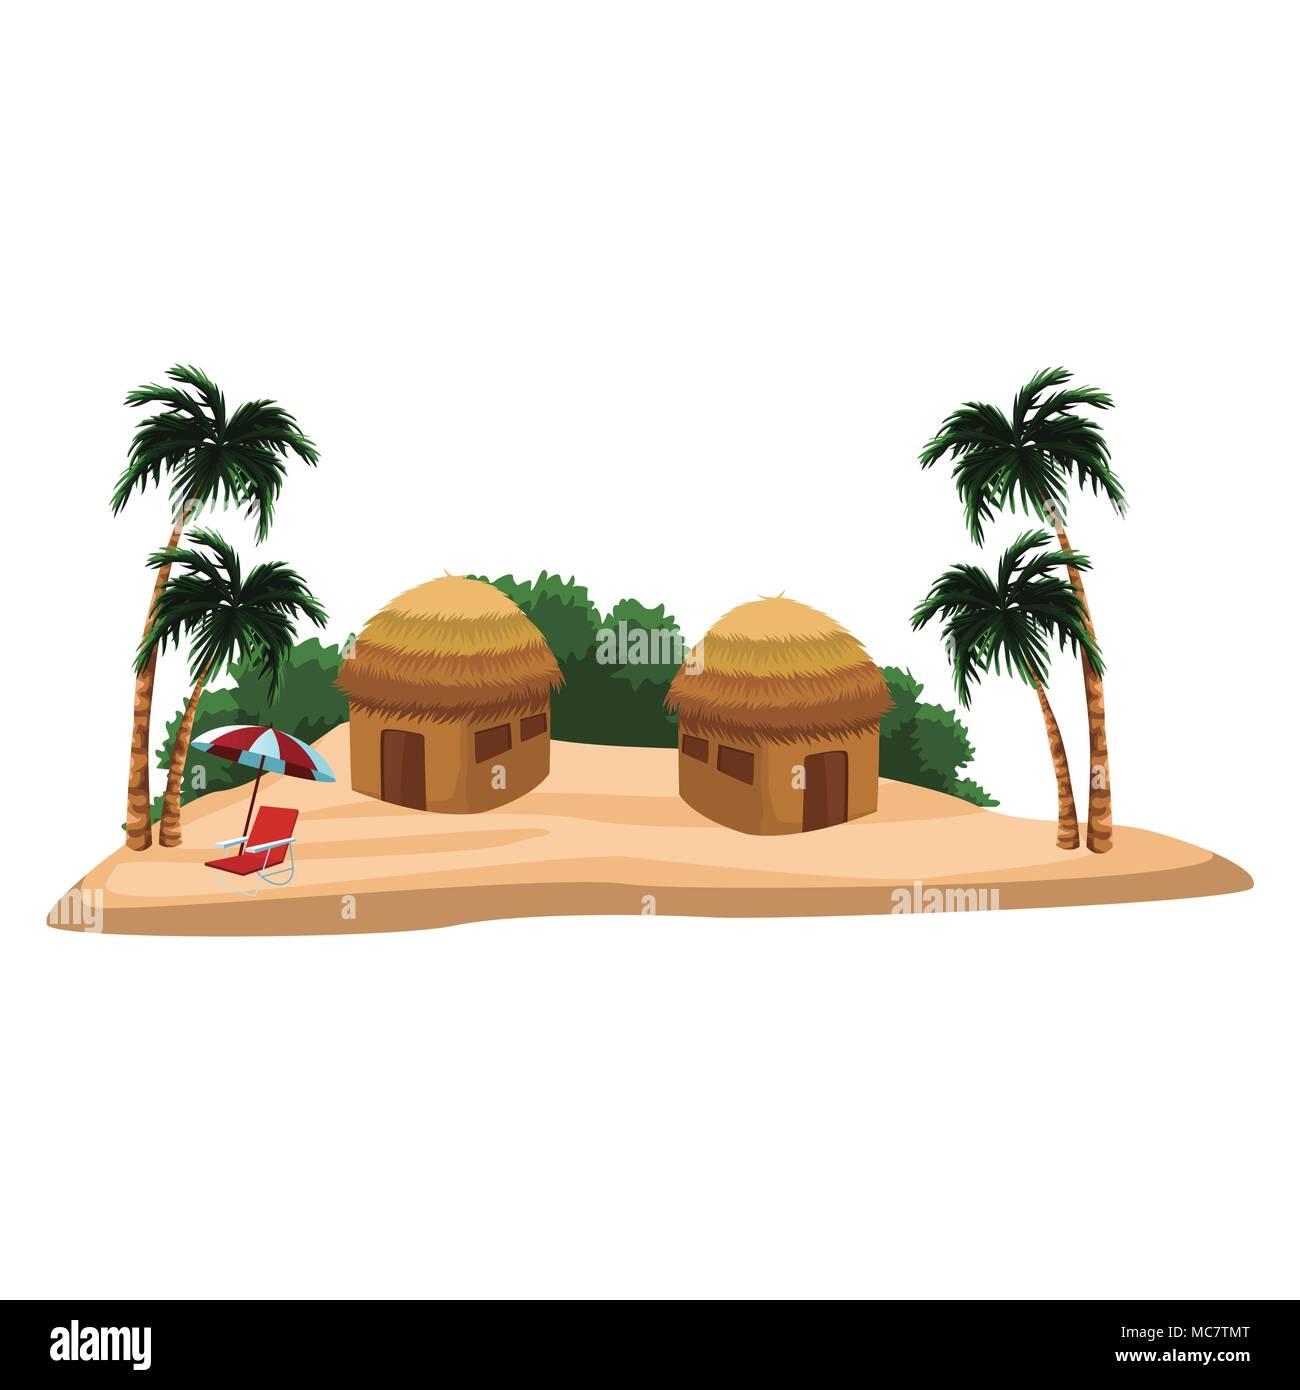 Huts at beach scenery - Stock Vector